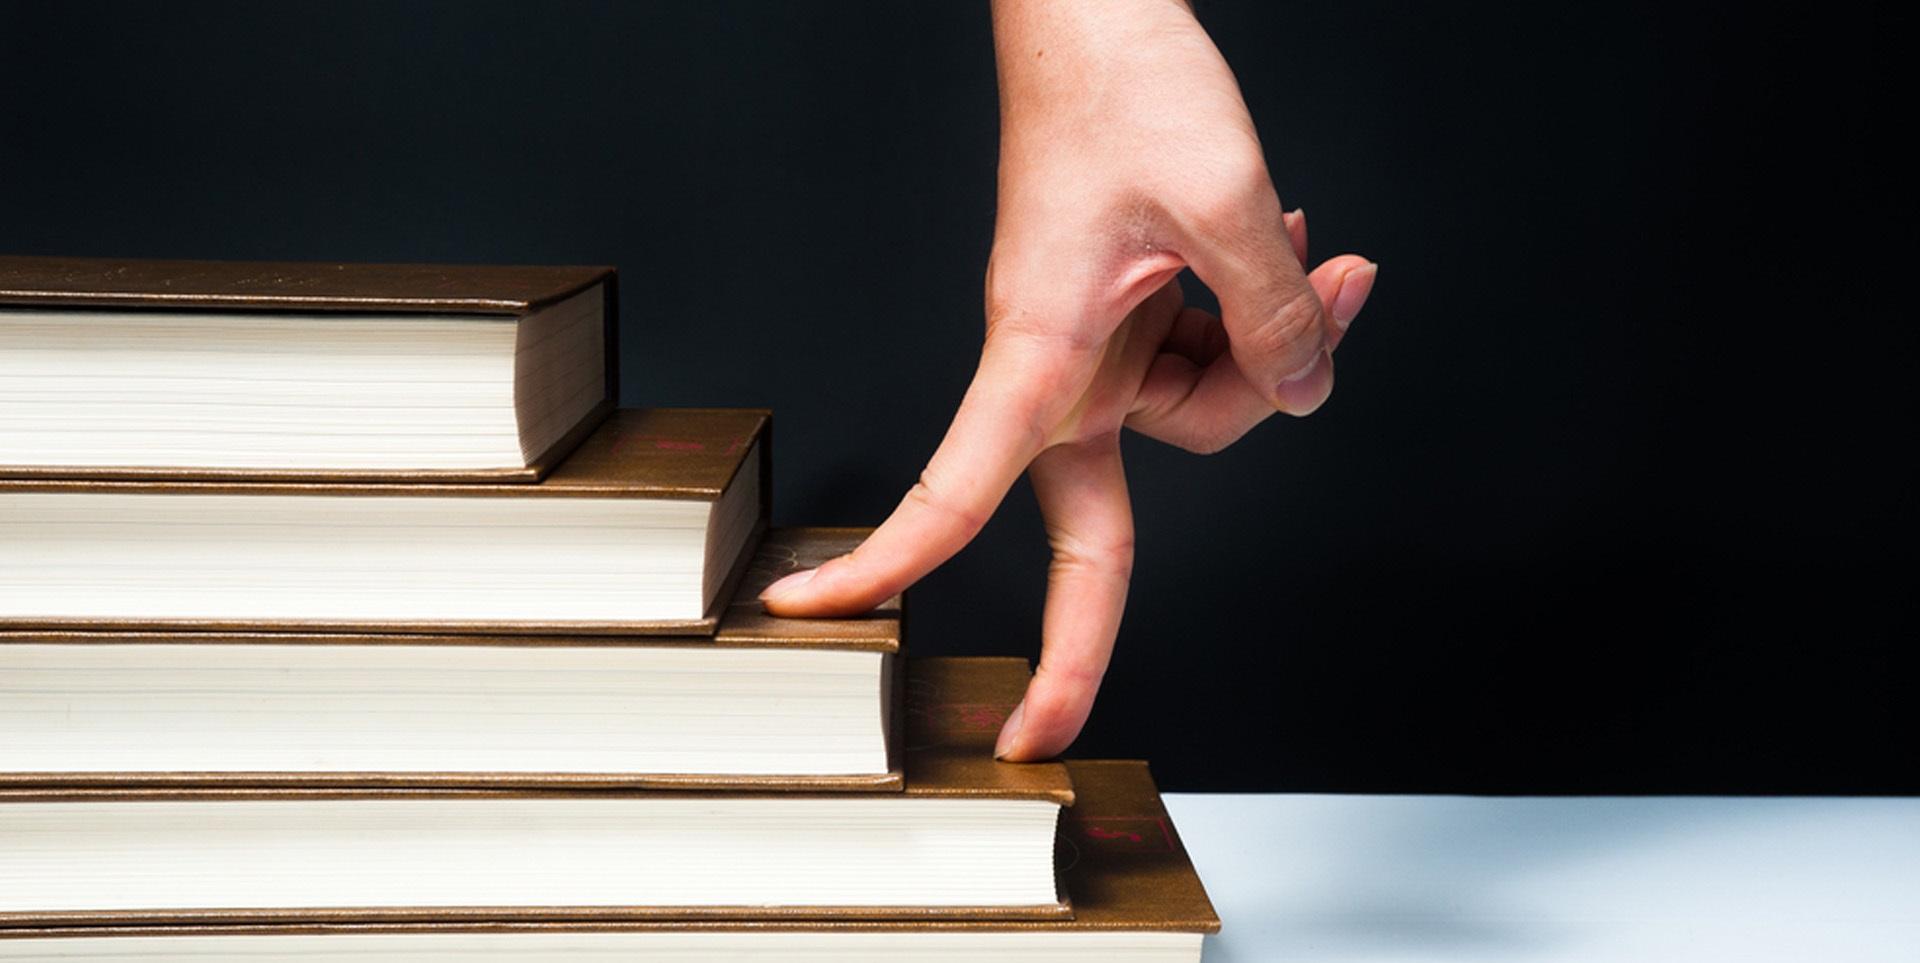 importancia_da_leitura_p_vida_profissional